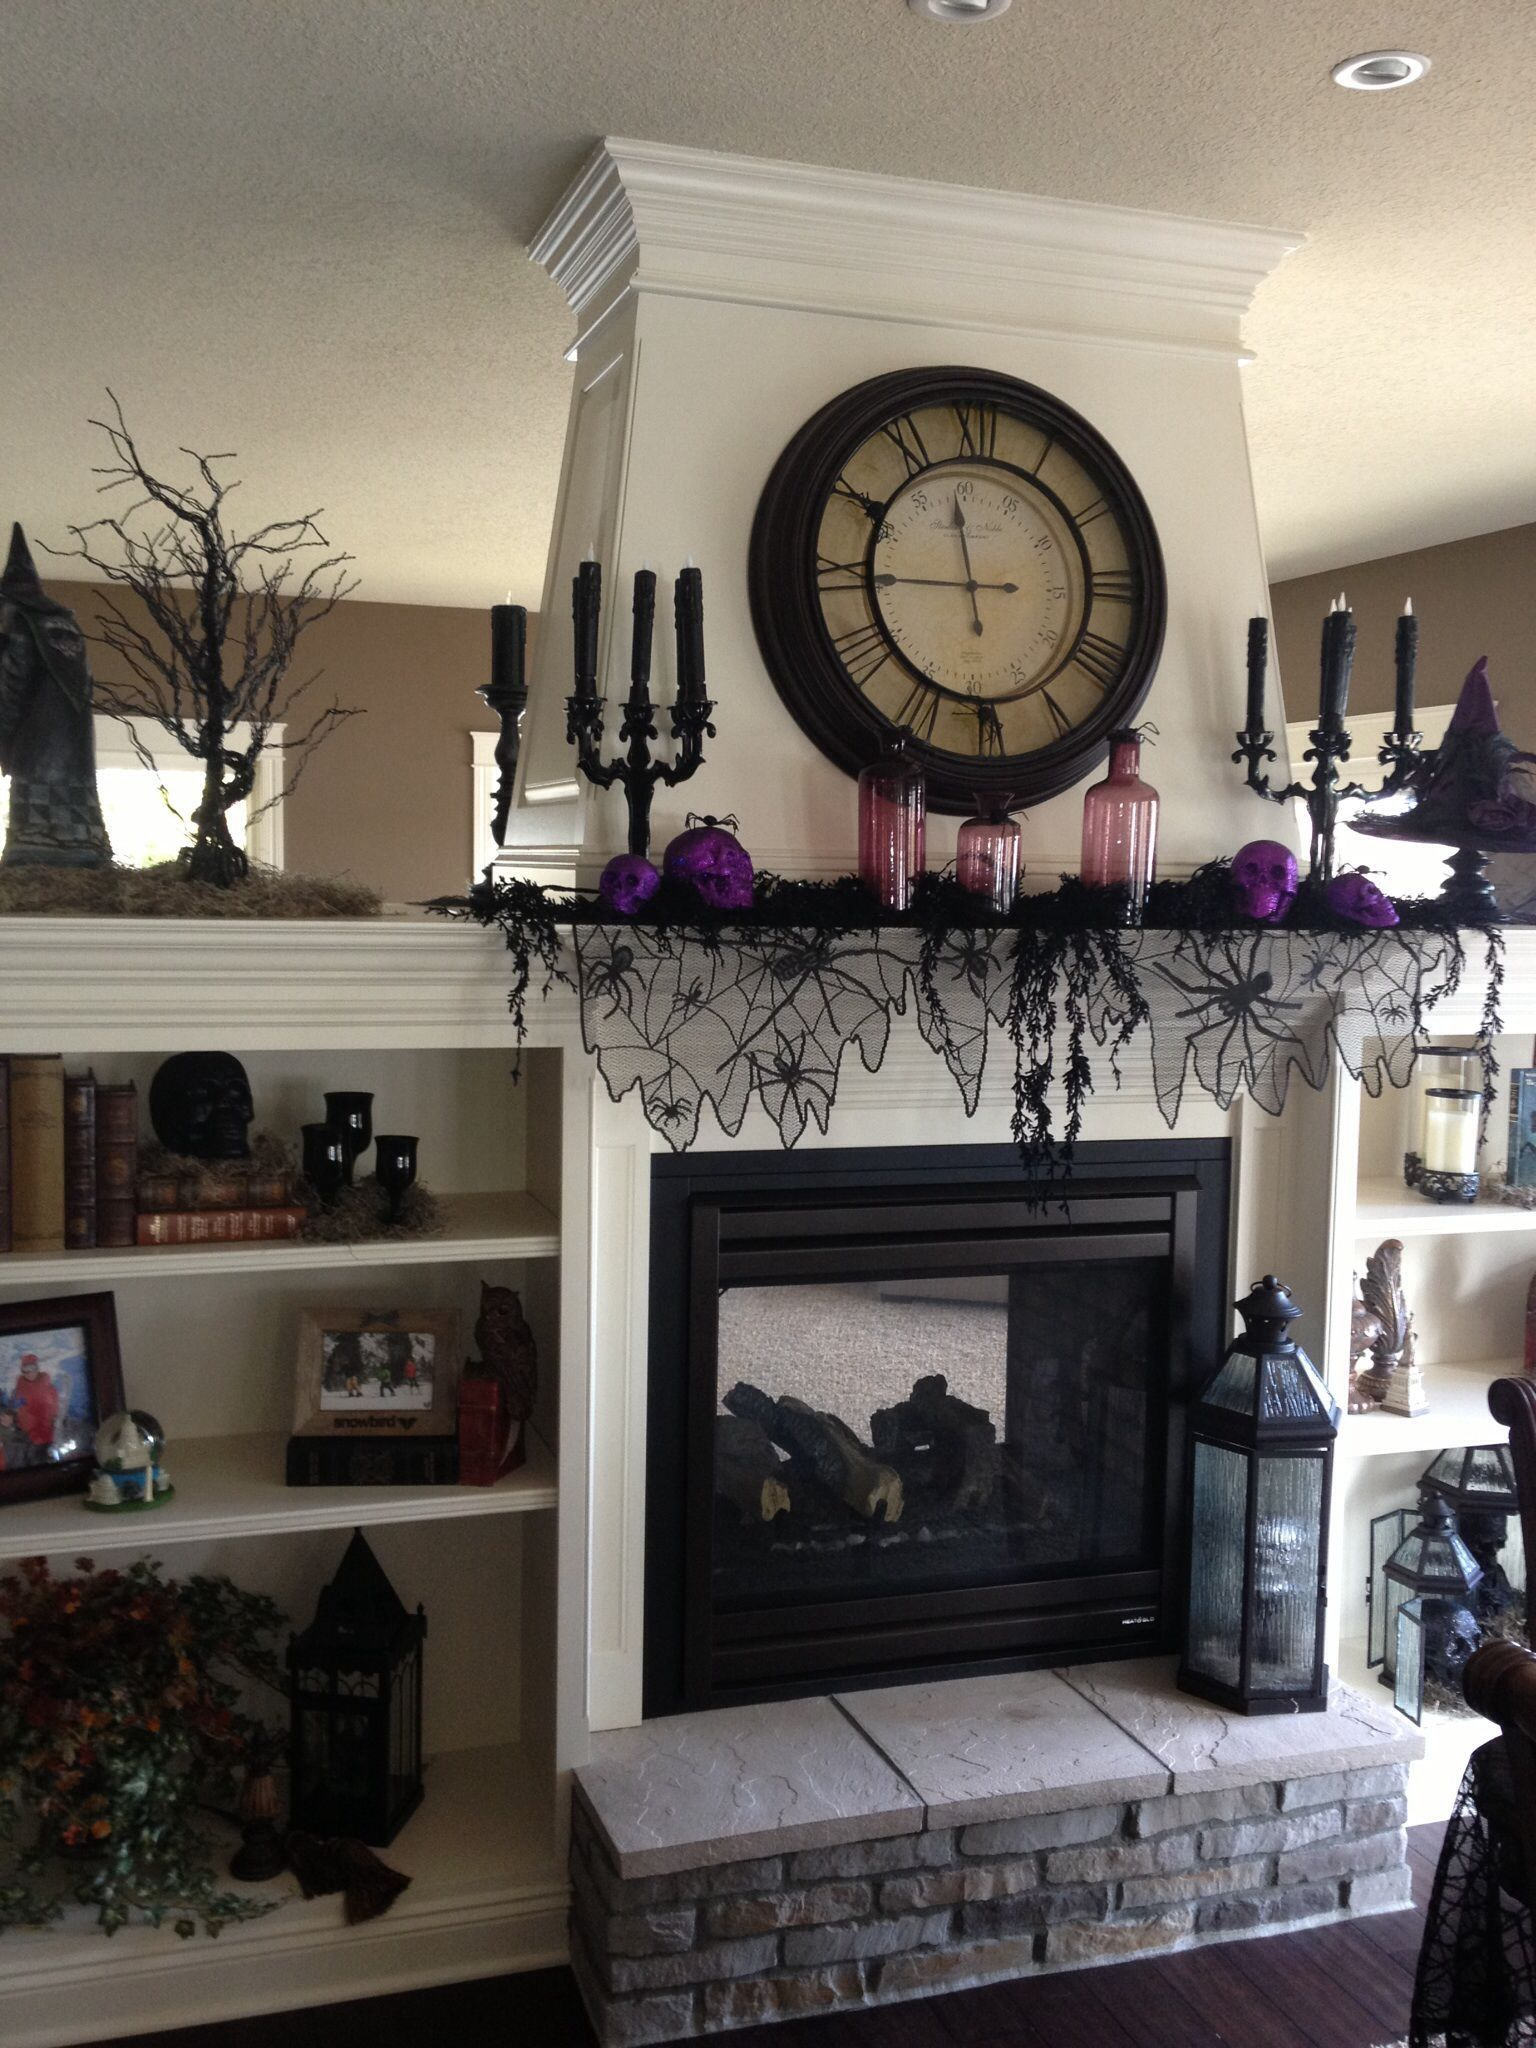 Clock Over Fireplace Inspirational 40 Incredible Halloween Fireplace Mantel Design Ideas